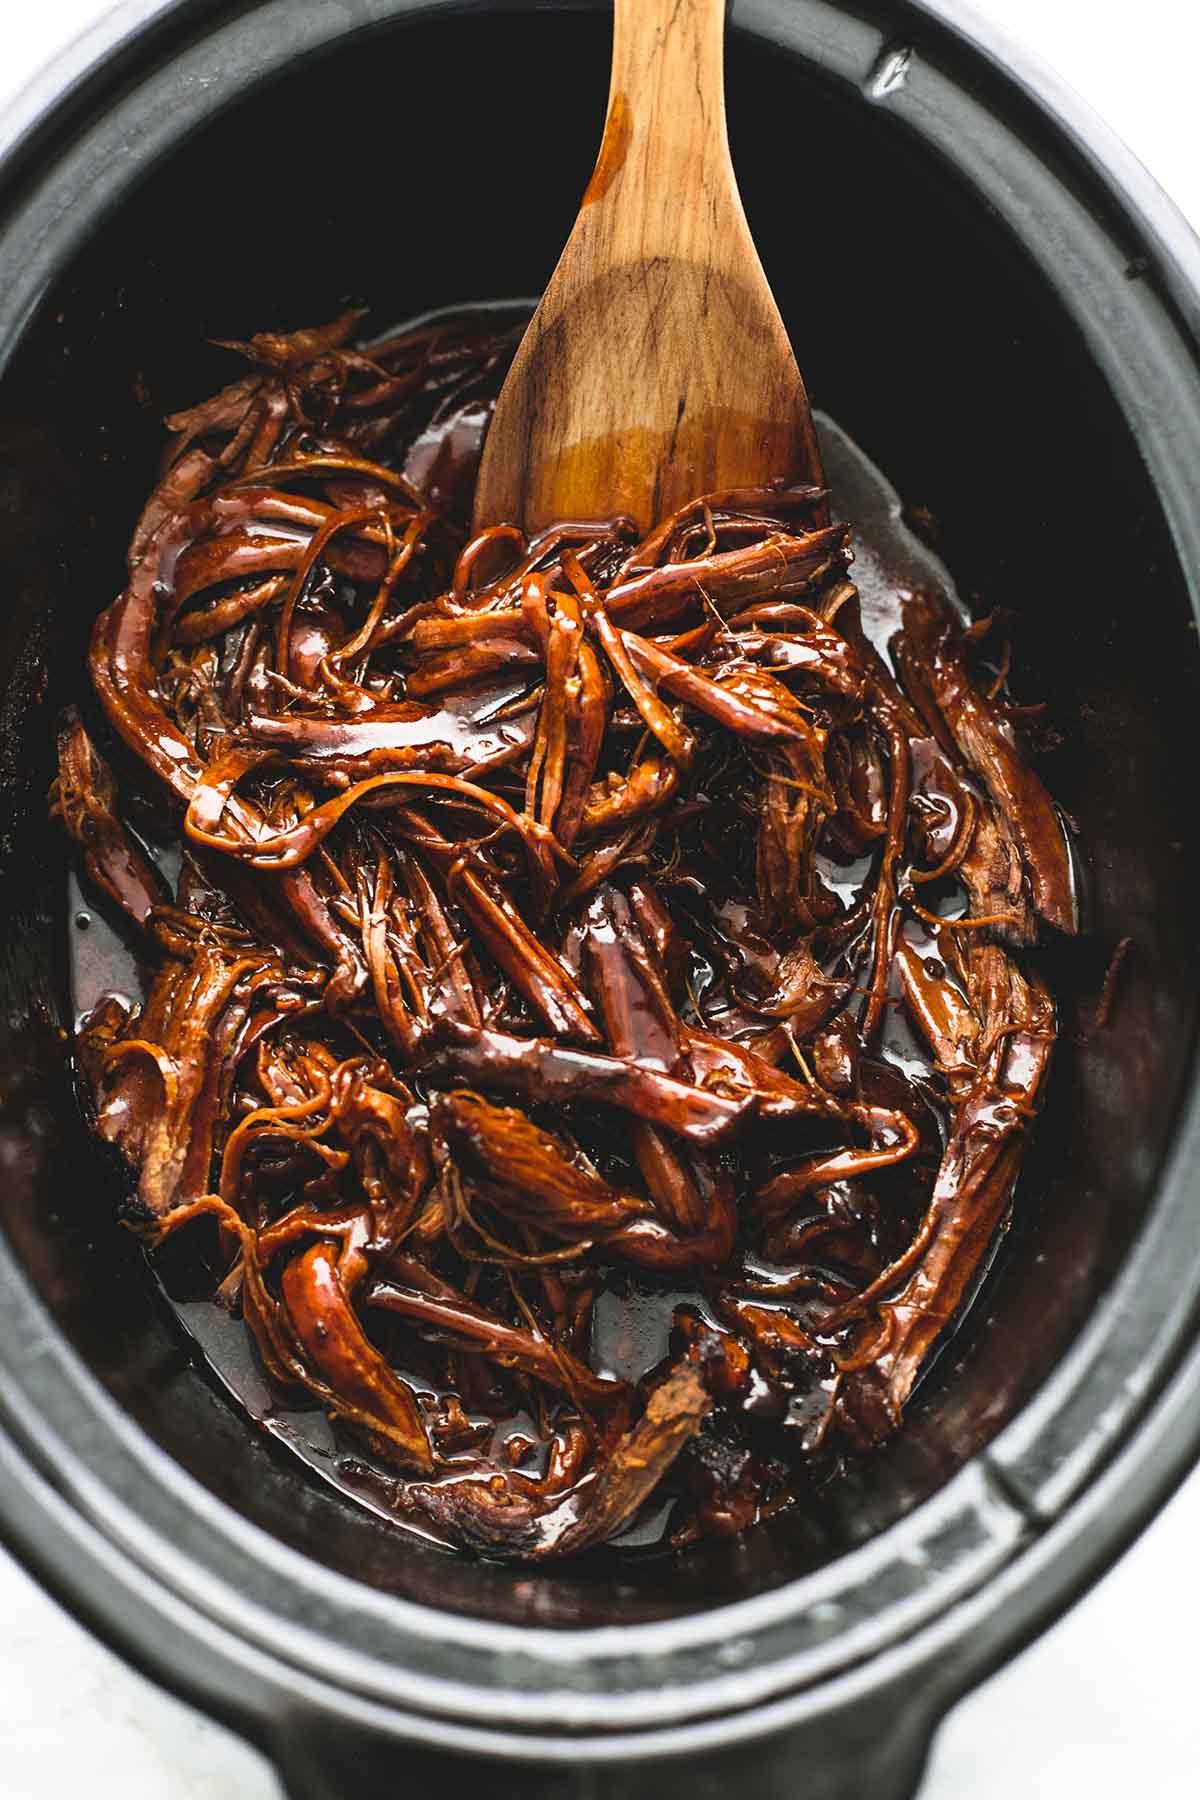 Bbq Beef Brisket Recipe  Slow Cooker Honey BBQ Beef Brisket